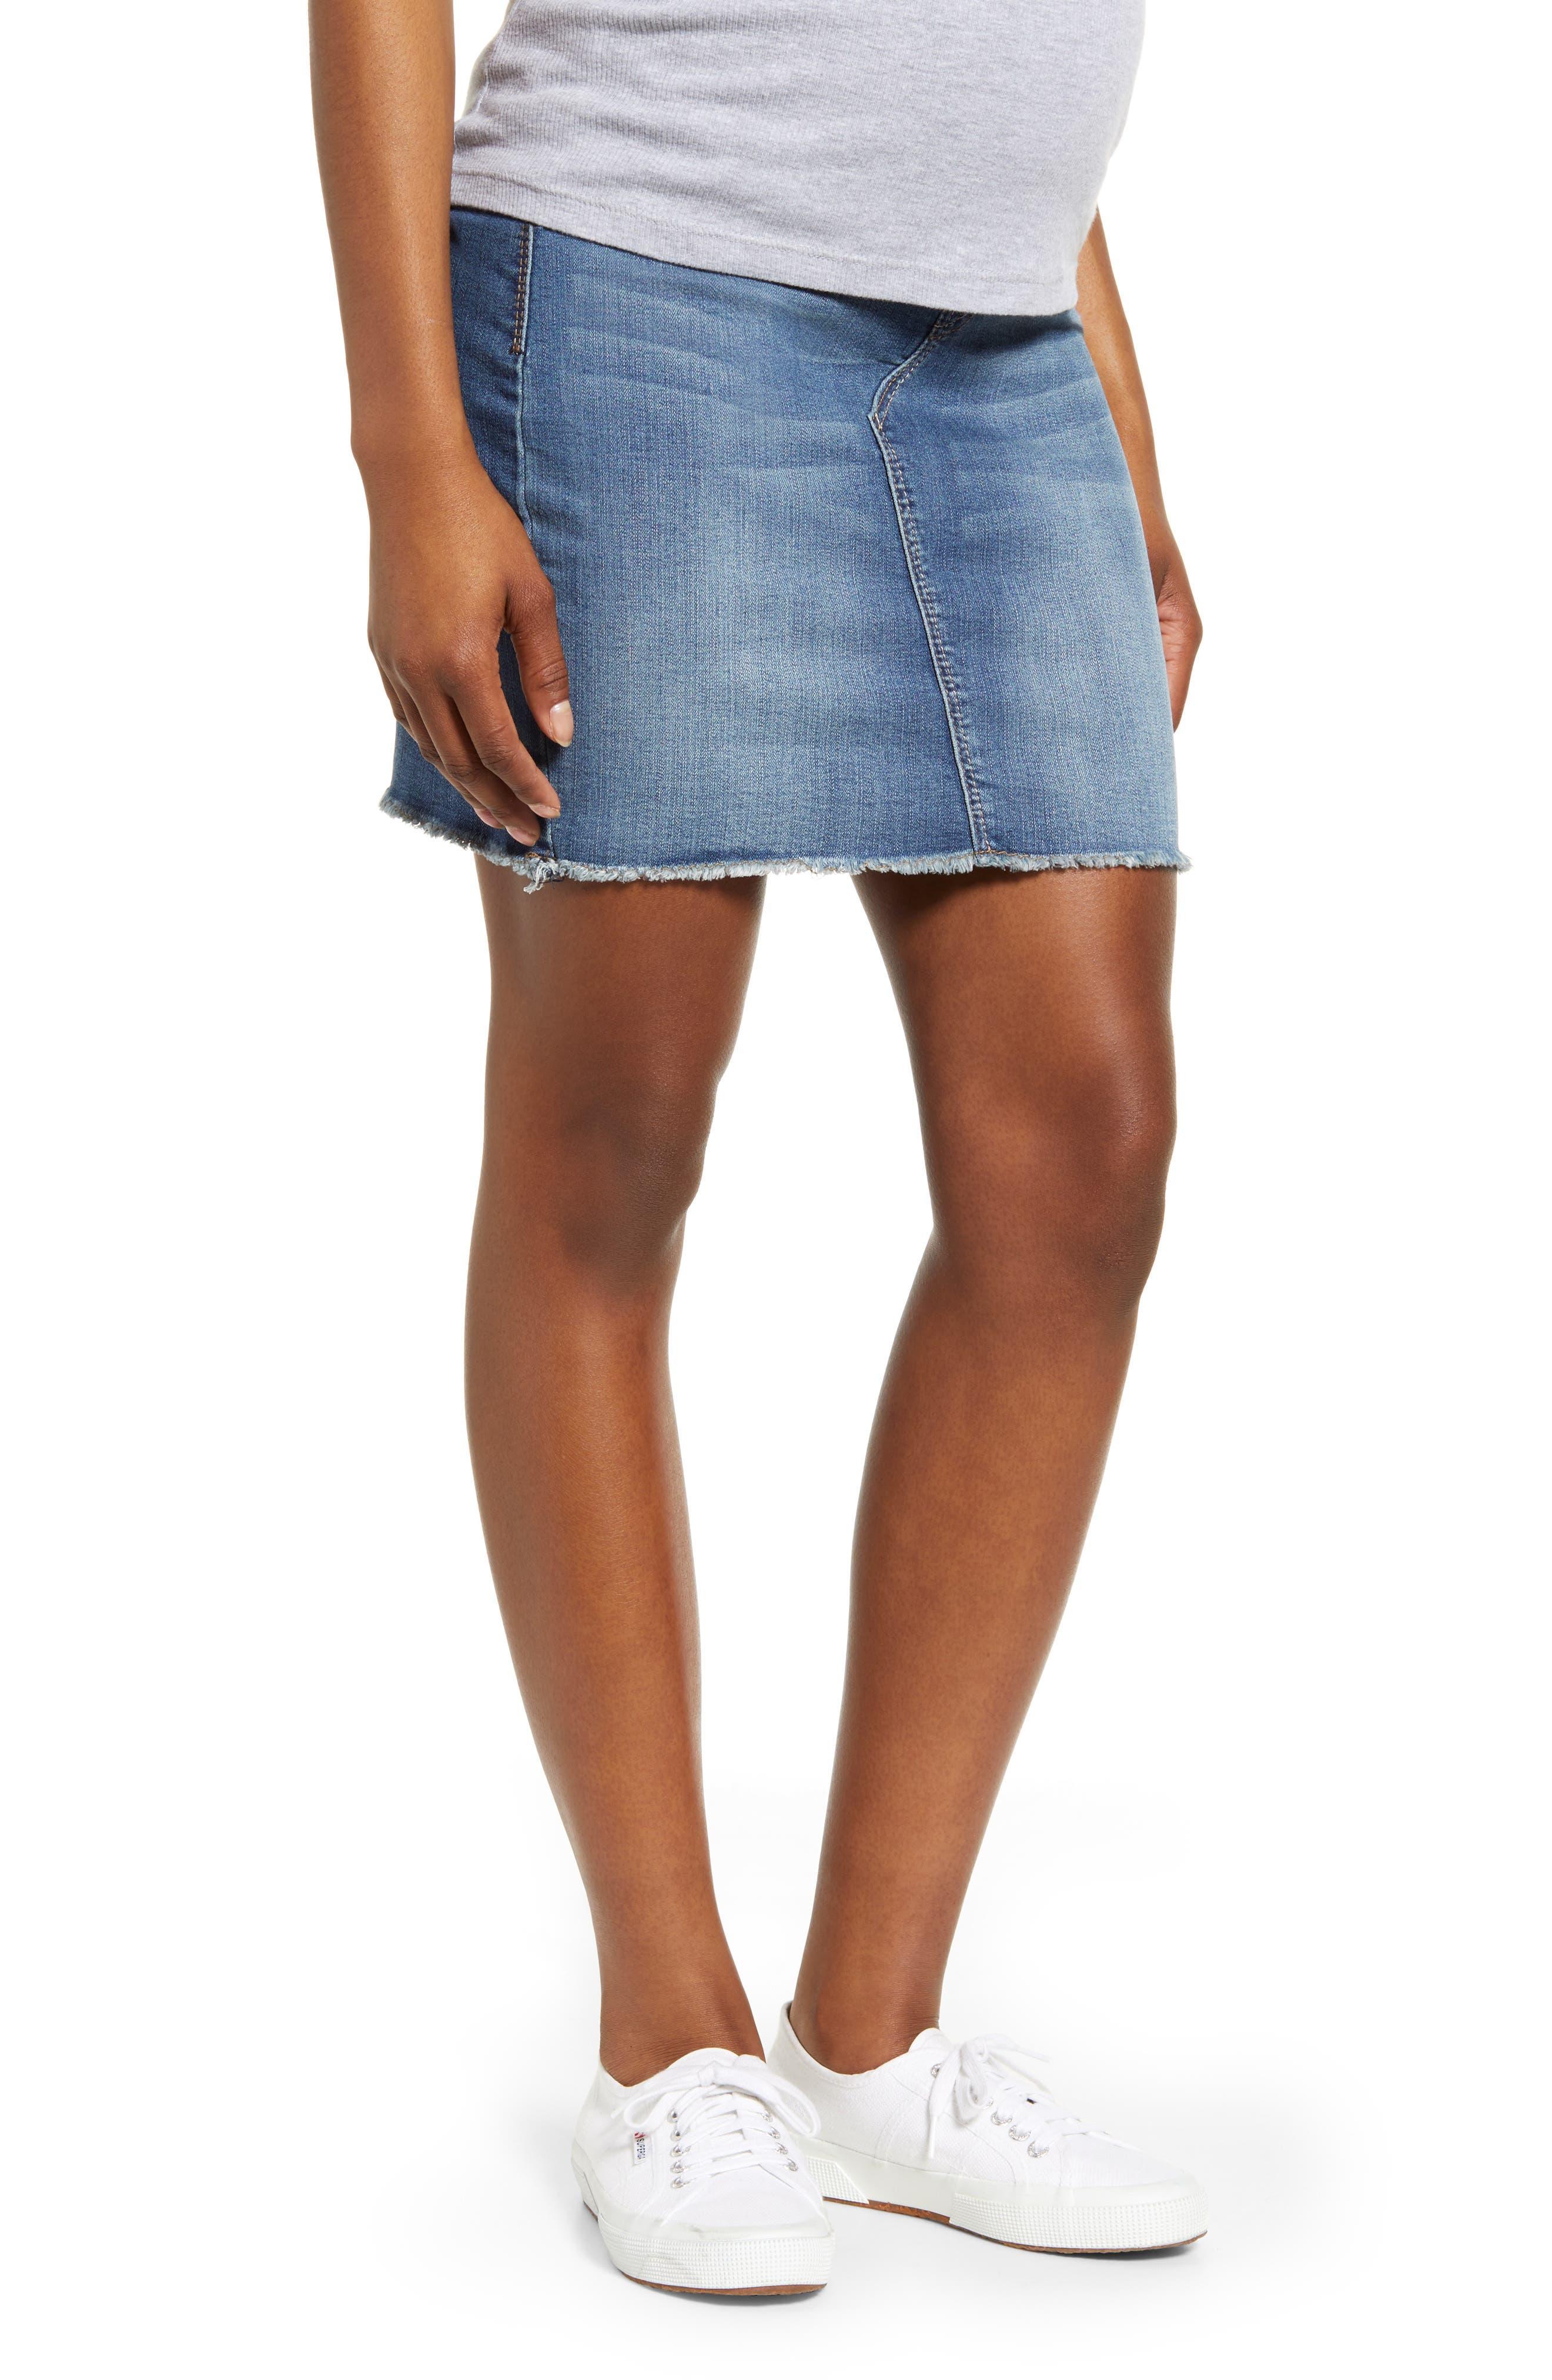 bac2adeb26 Women's 1822 Denim Jeans & Denim | Nordstrom